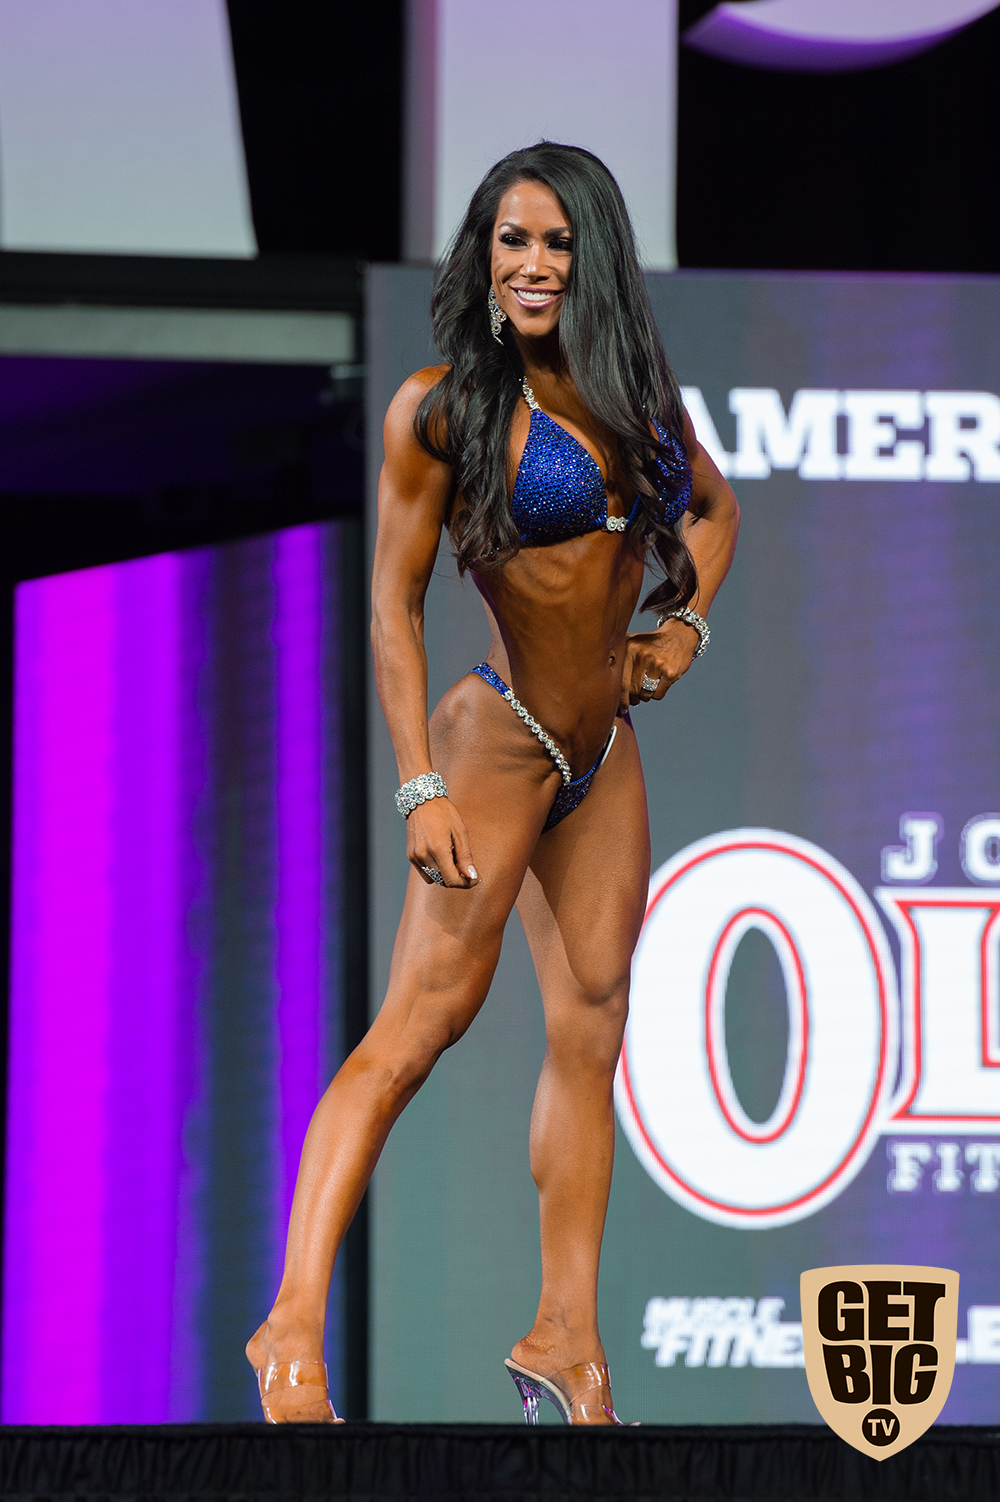 Jennifer Ronzitti / USA - 6 место «Bikini Olympia»-2018